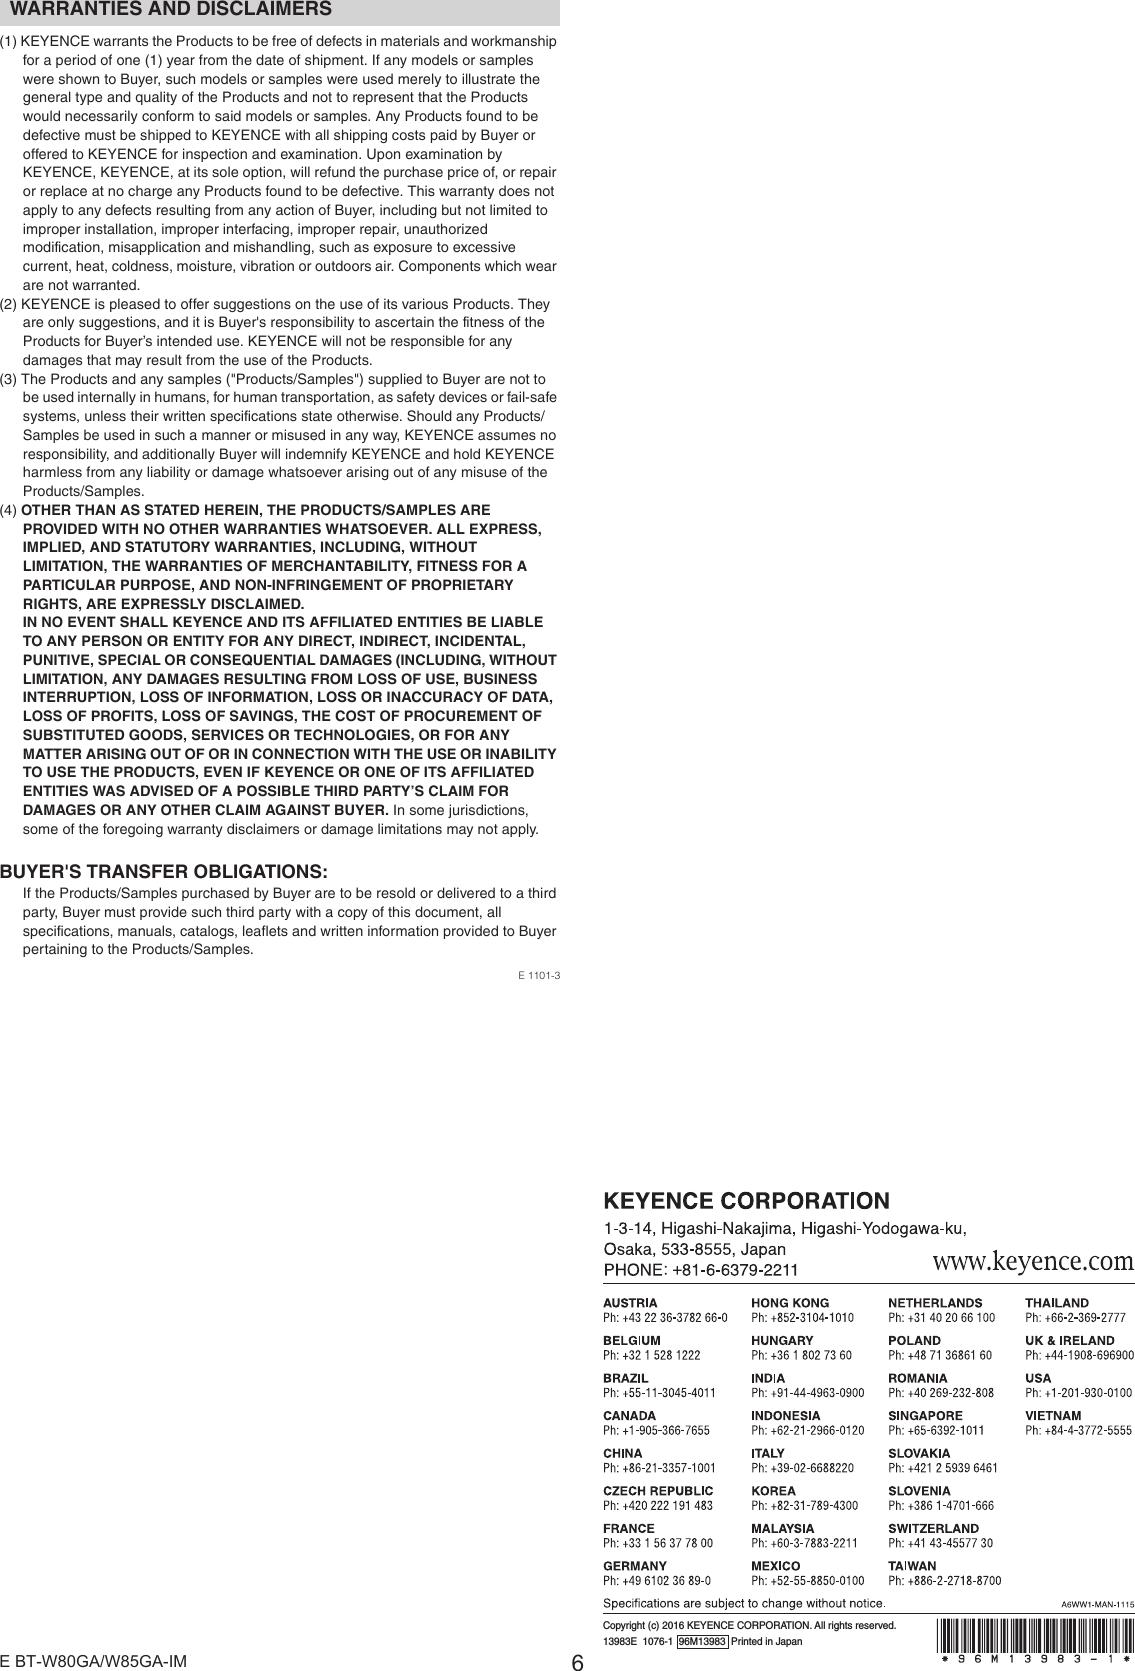 Keyence B Handheld Mobile Computer User Manual Users